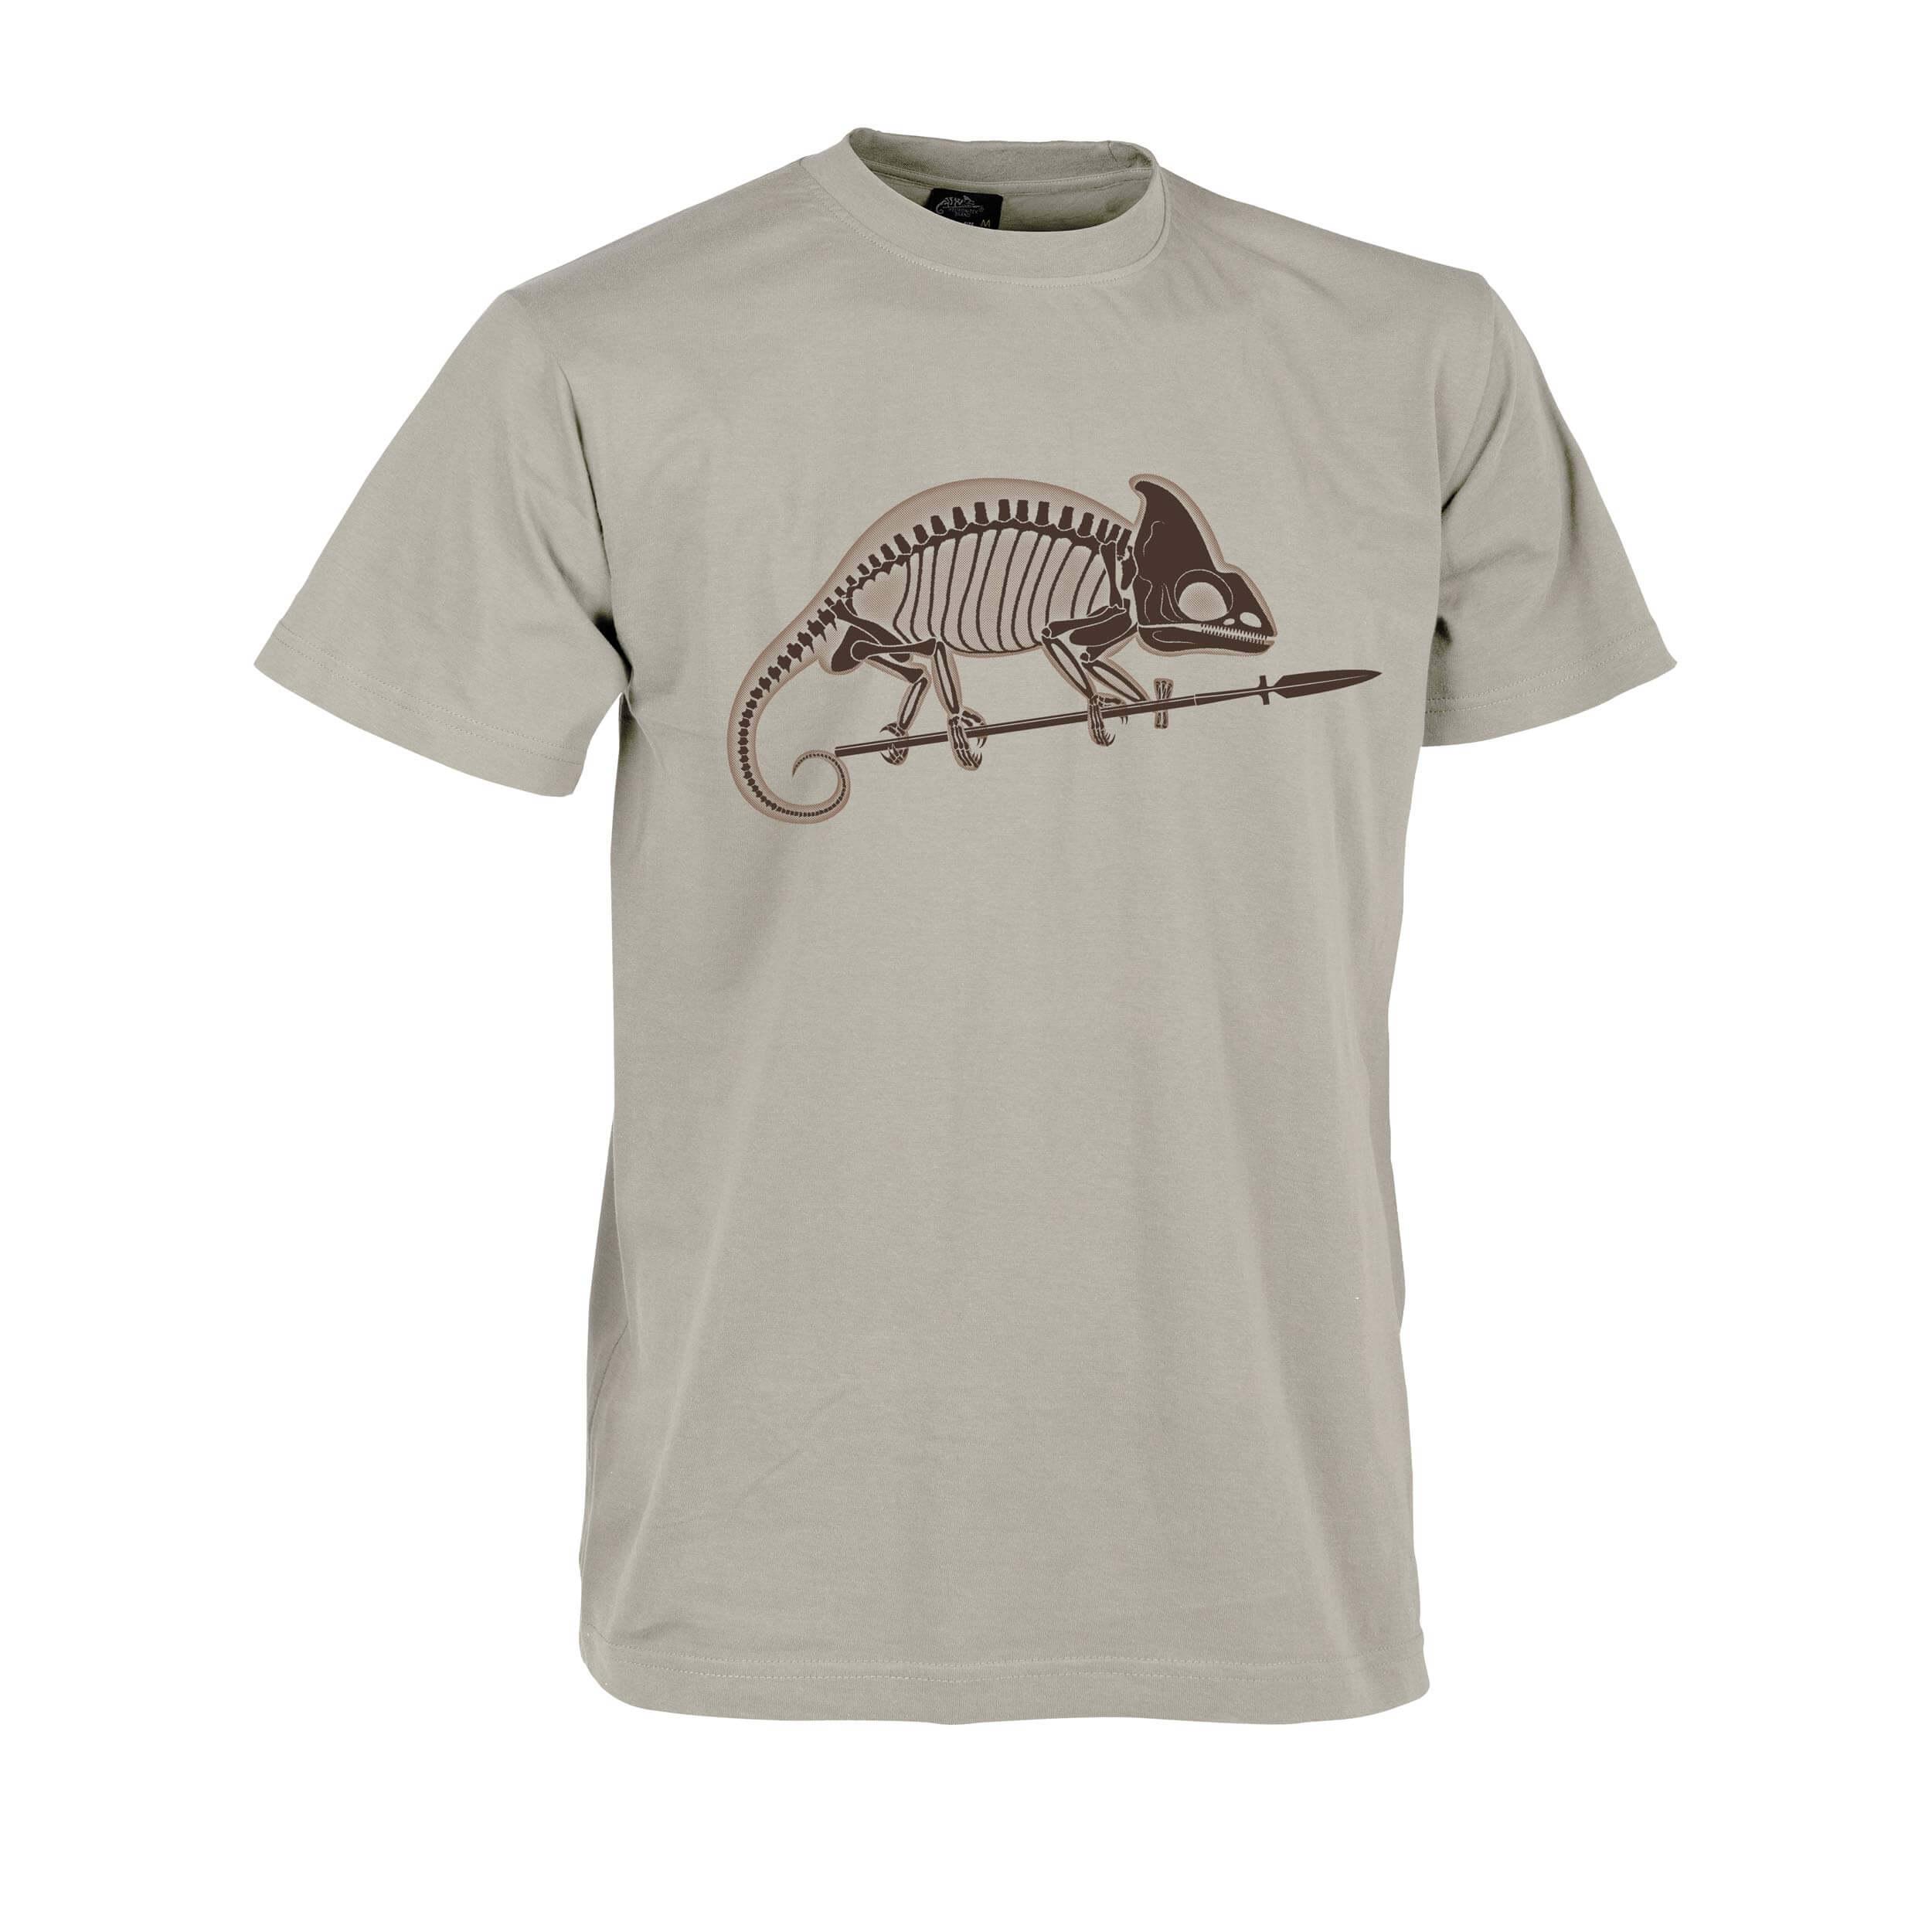 Helikon-Tex T-Shirt Chameleon Skeleton Khaki